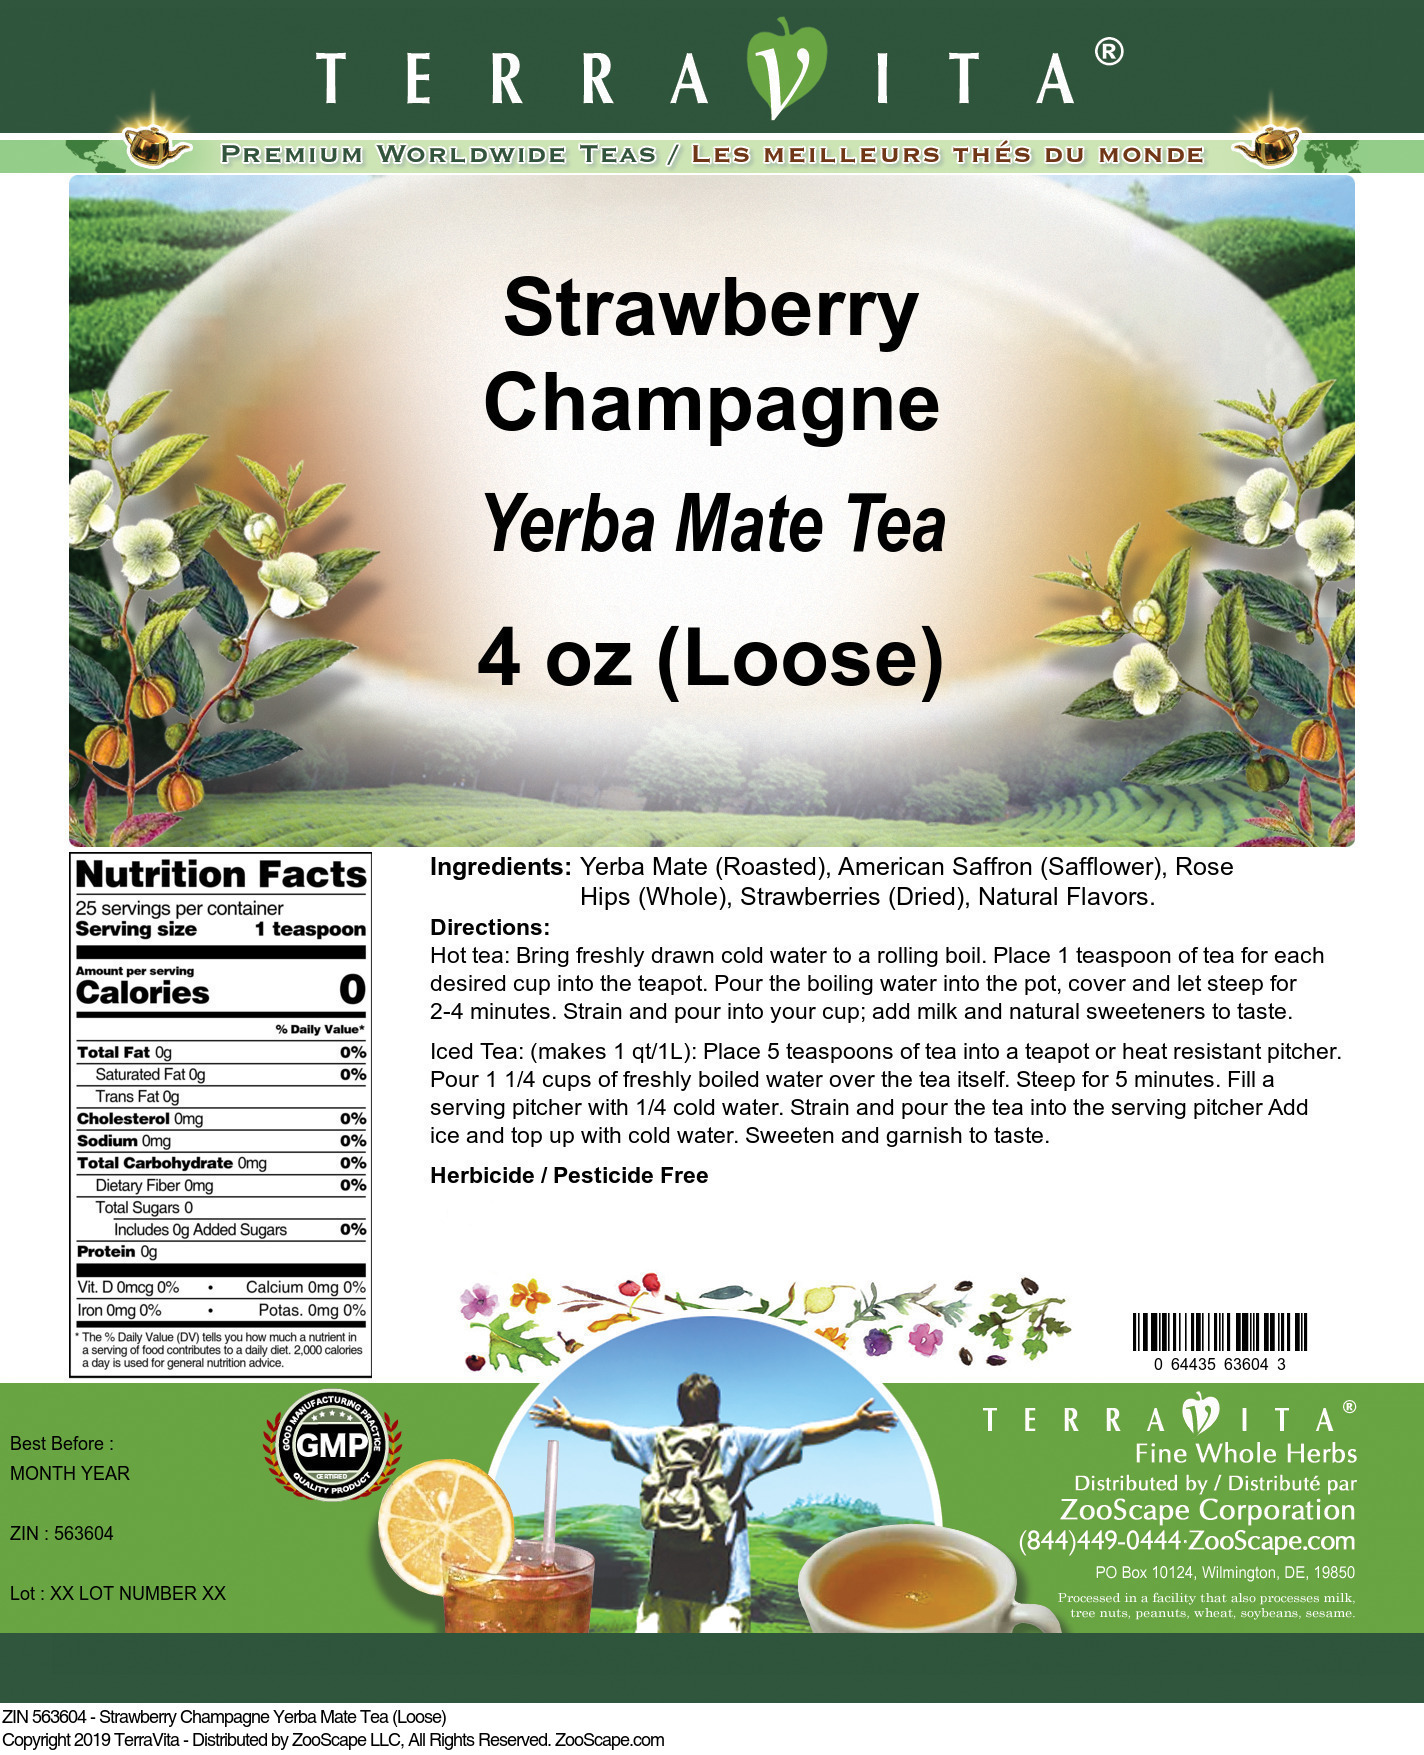 Strawberry Champagne Yerba Mate Tea (Loose)